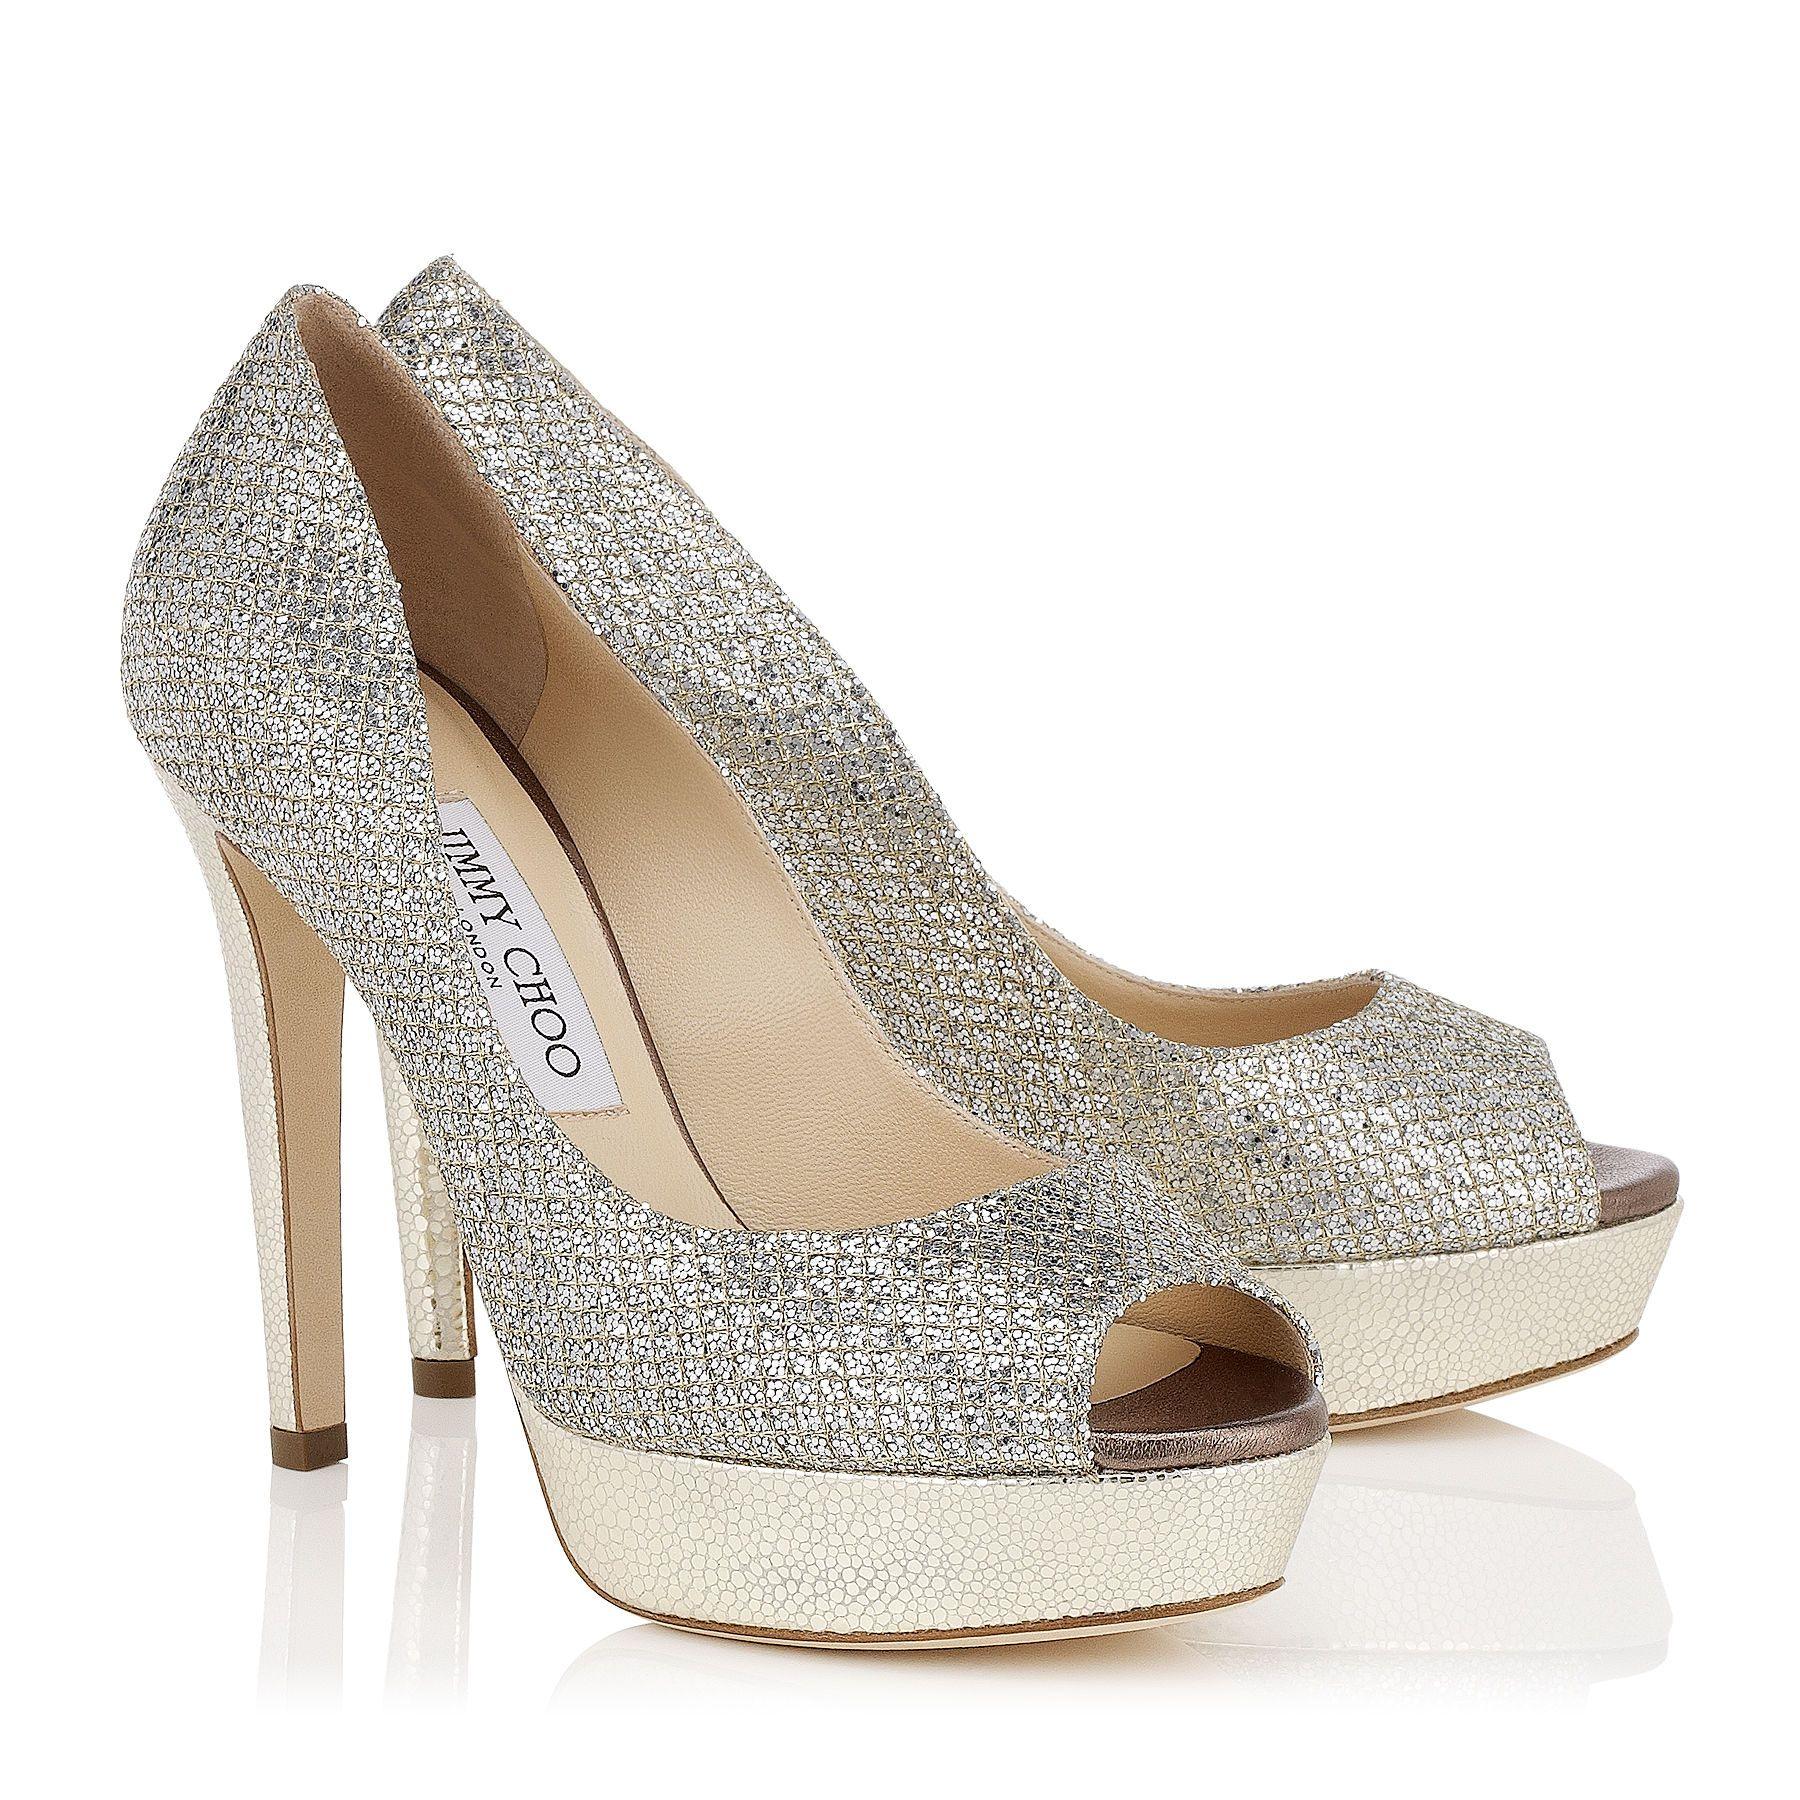 02464ec1fe7c DAHLIA - CHAMPAGNE GFA Shoes. DAHLIA - CHAMPAGNE GFA Shoes Glitter Fabric